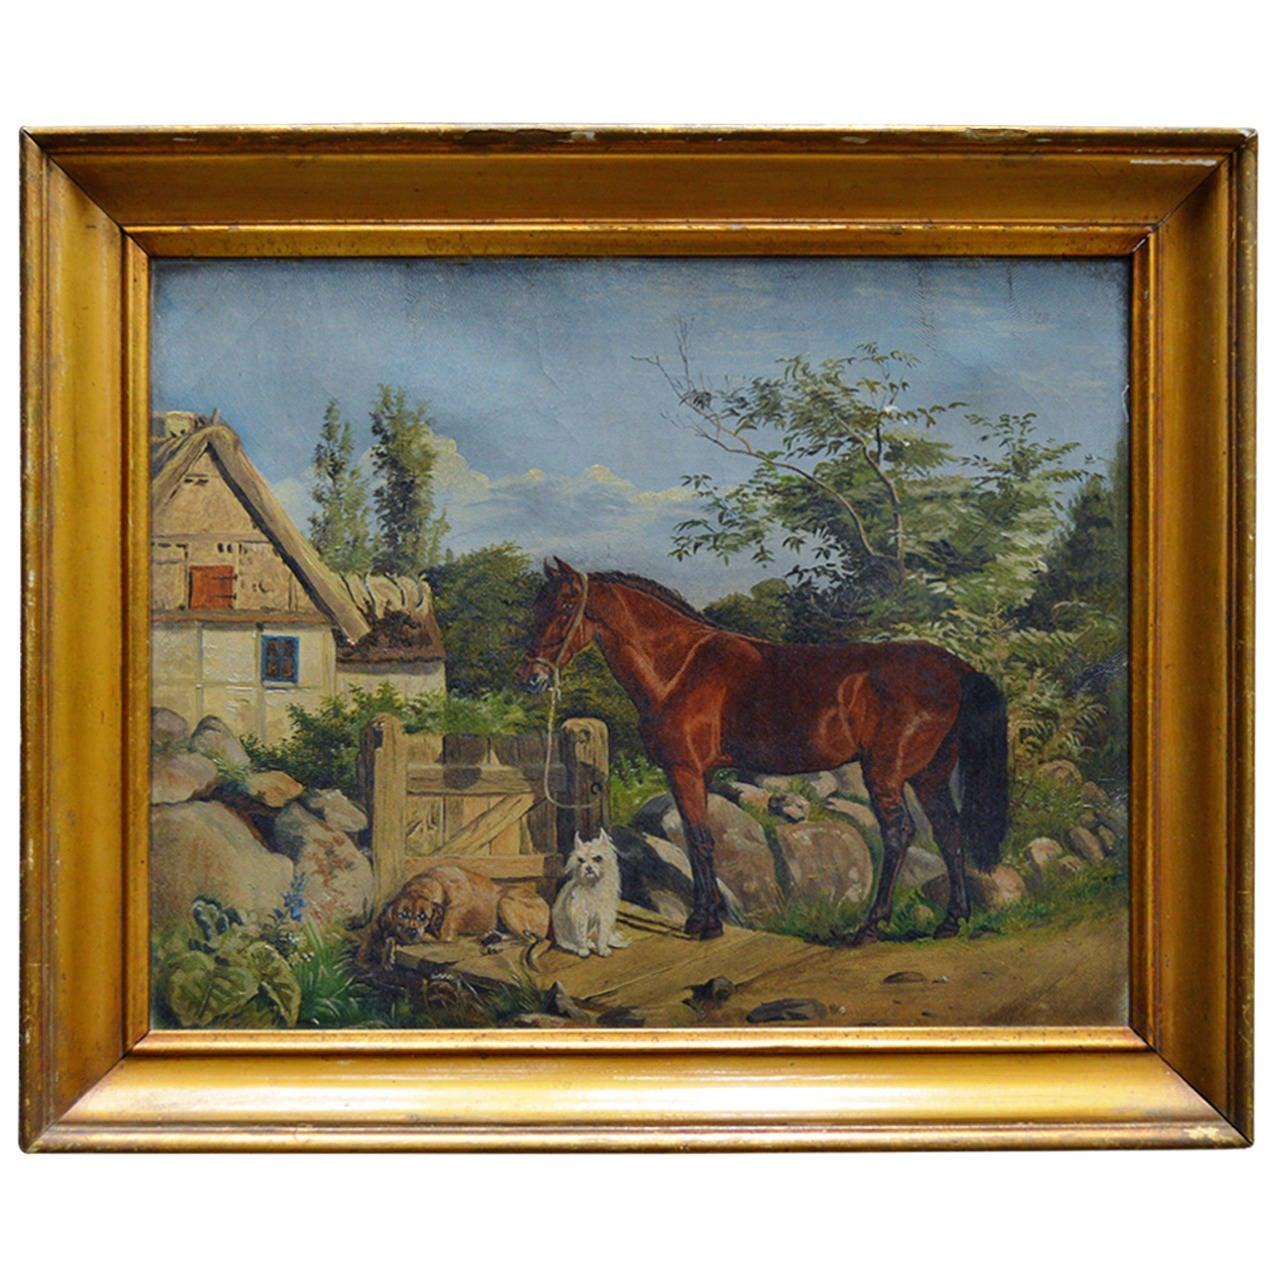 Antique Framed Flemish Equine and Dog Painting